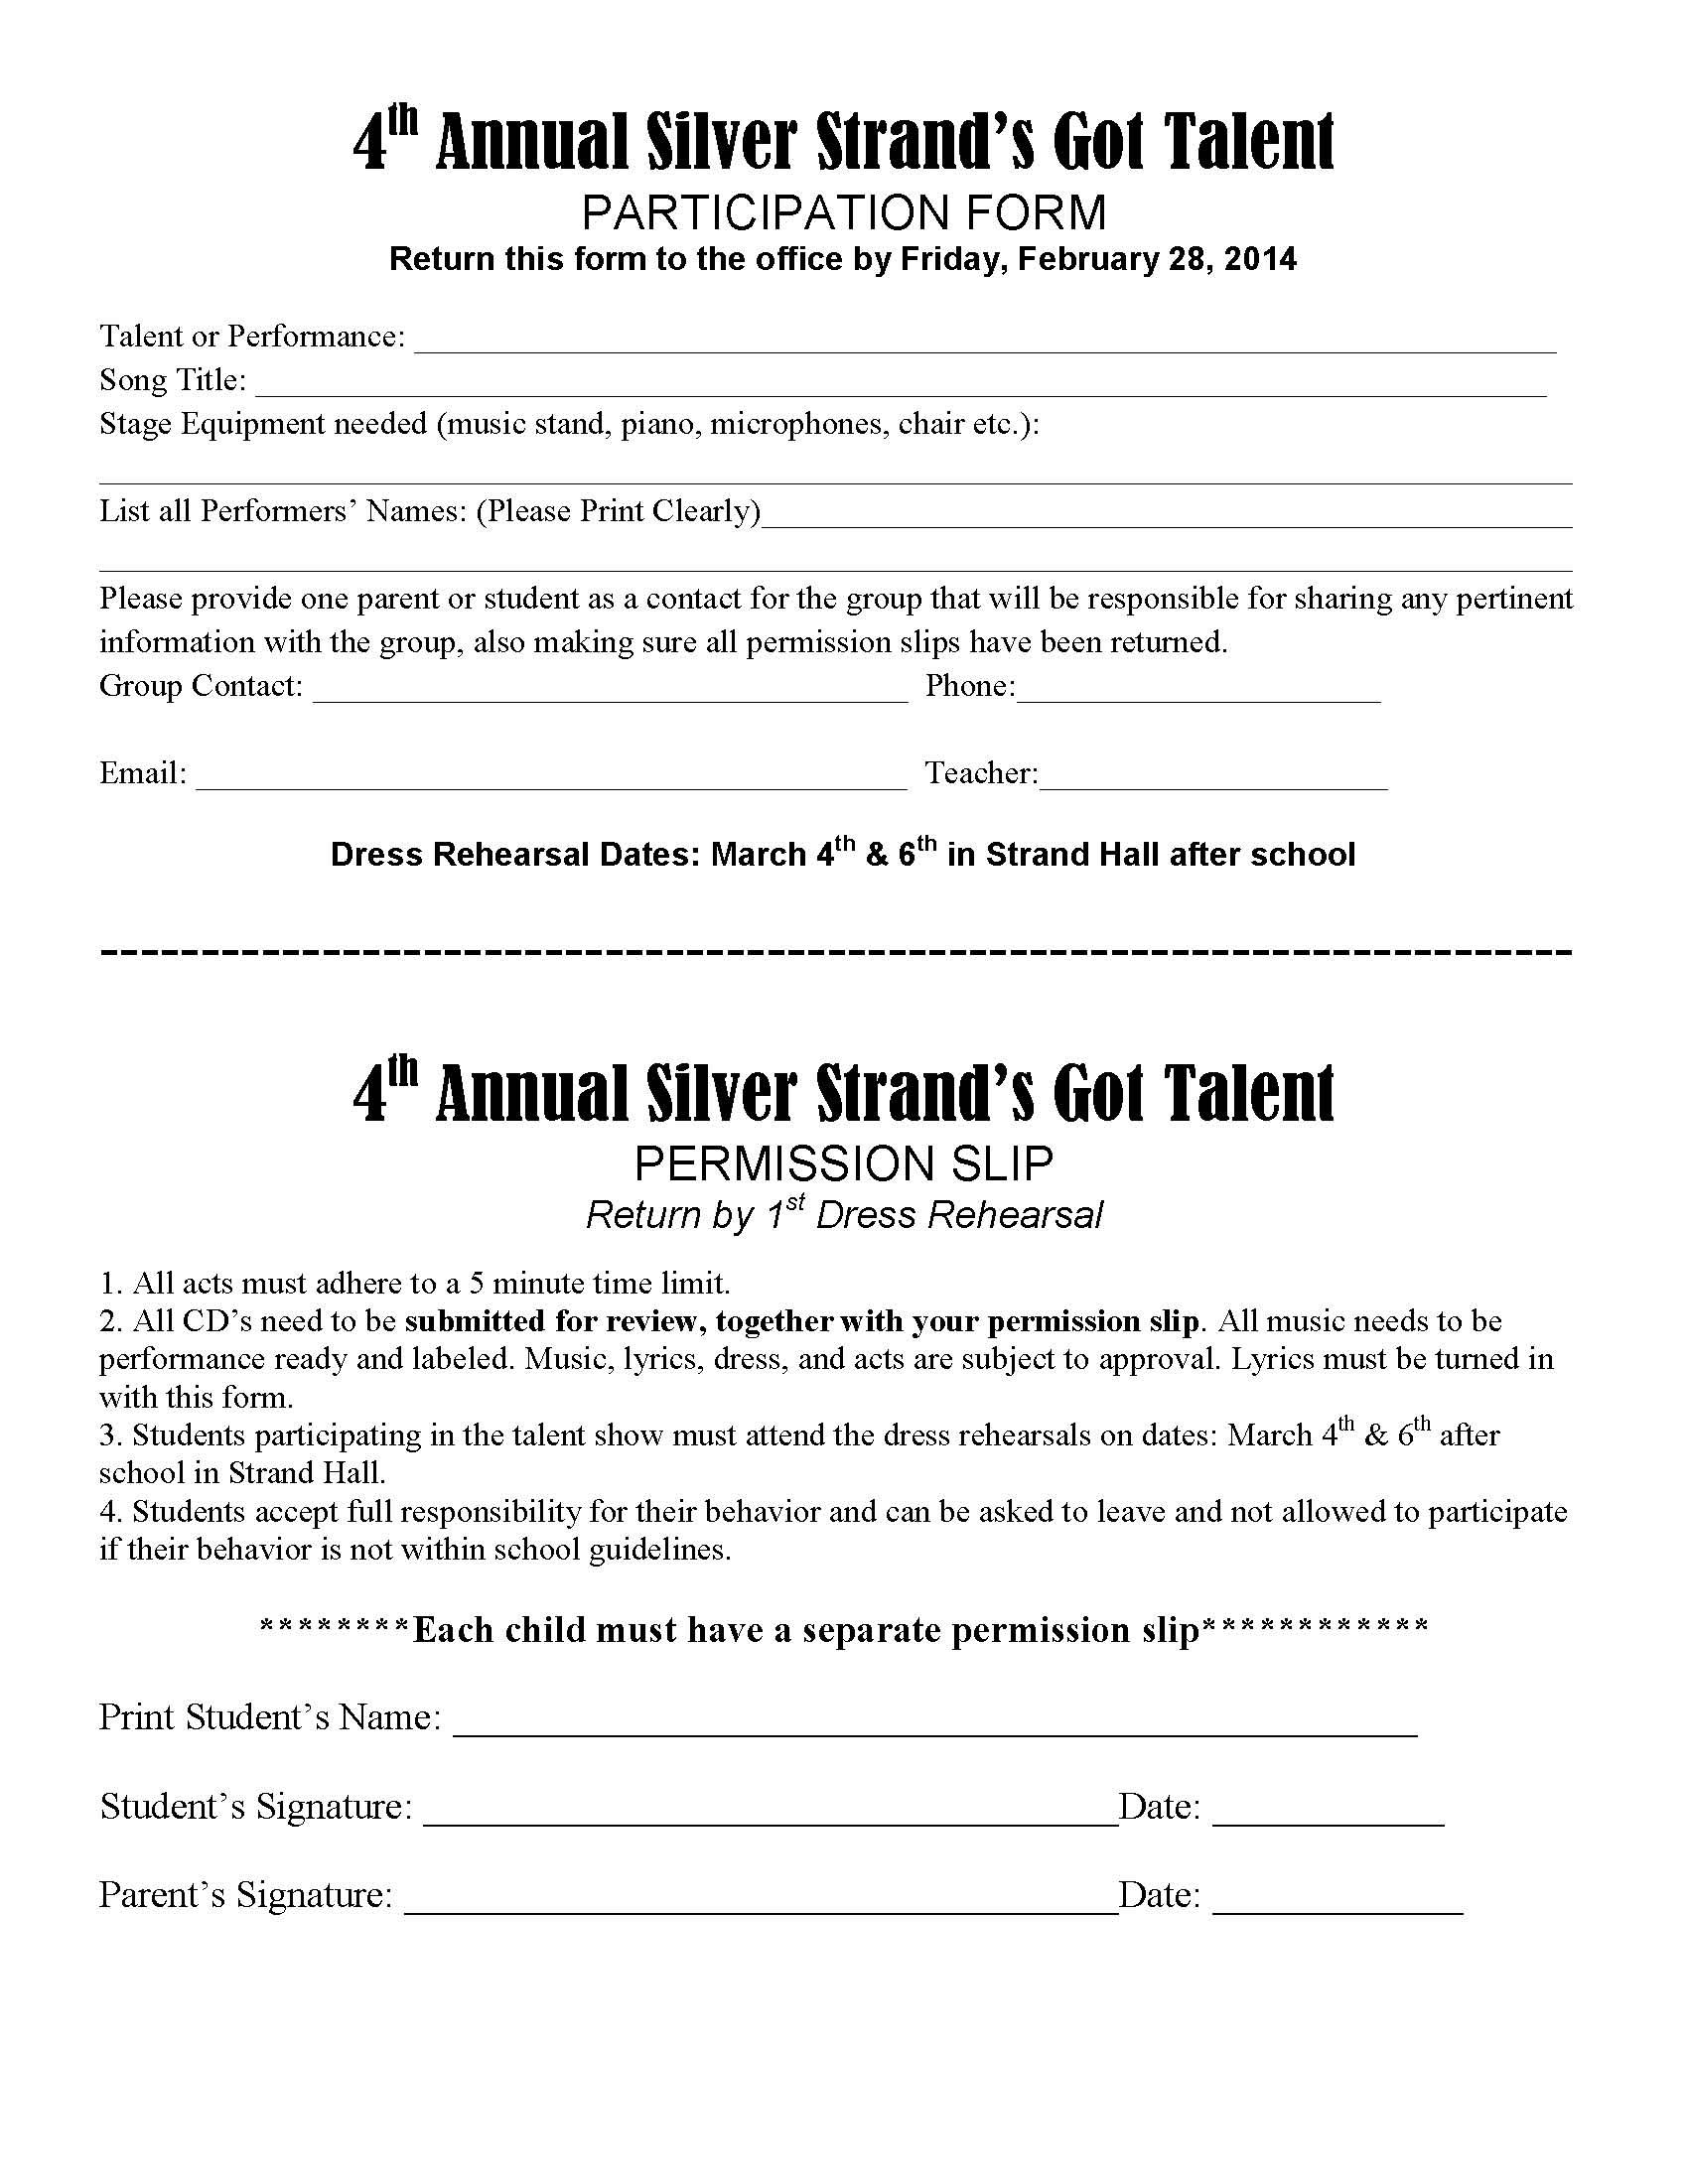 silver strand elementary talent show permission slip deadline